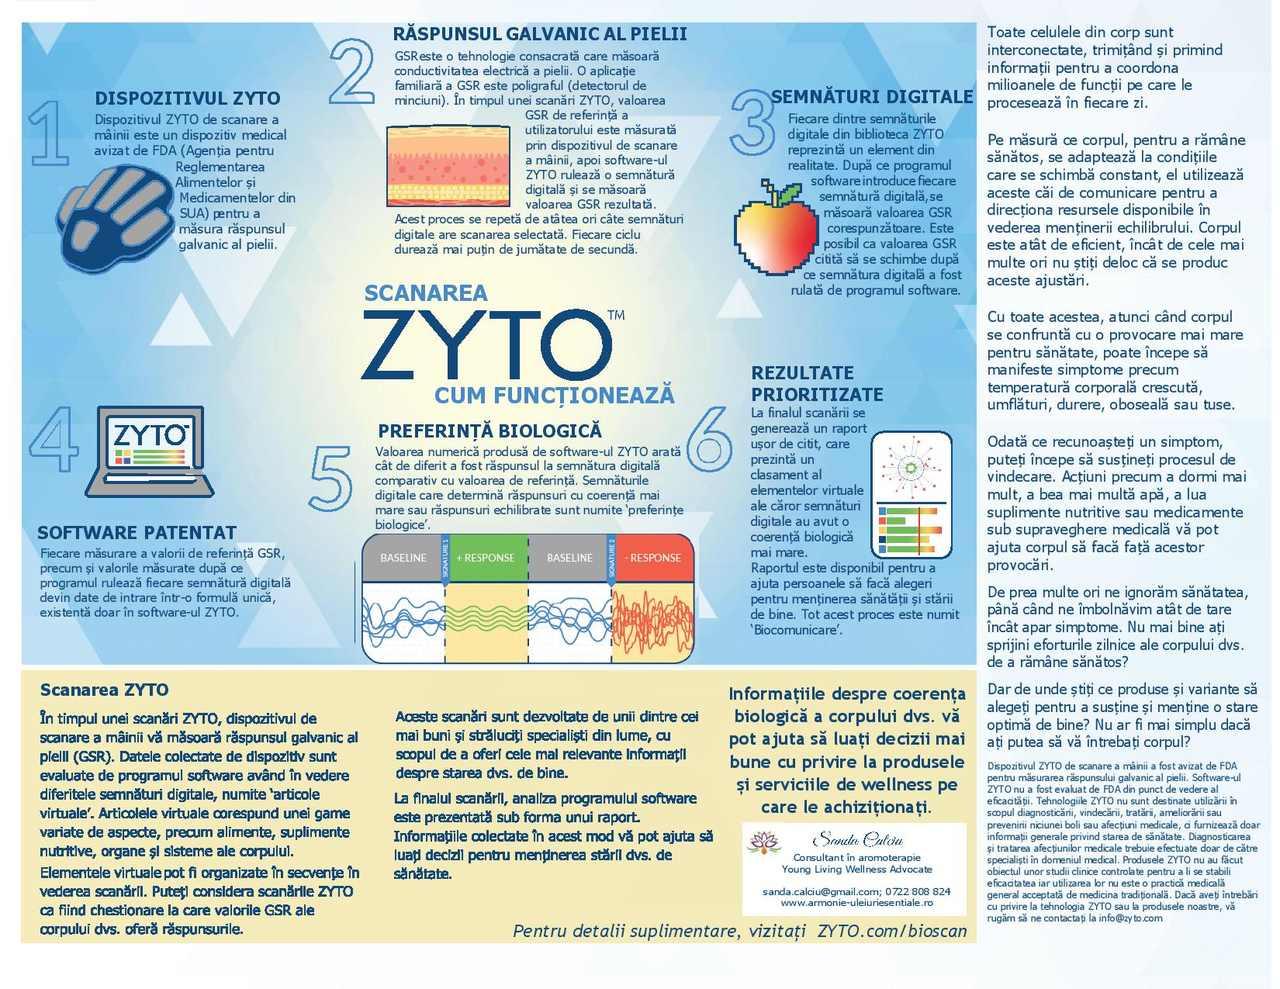 ZYTO flyer_Cum functioneaza_resized